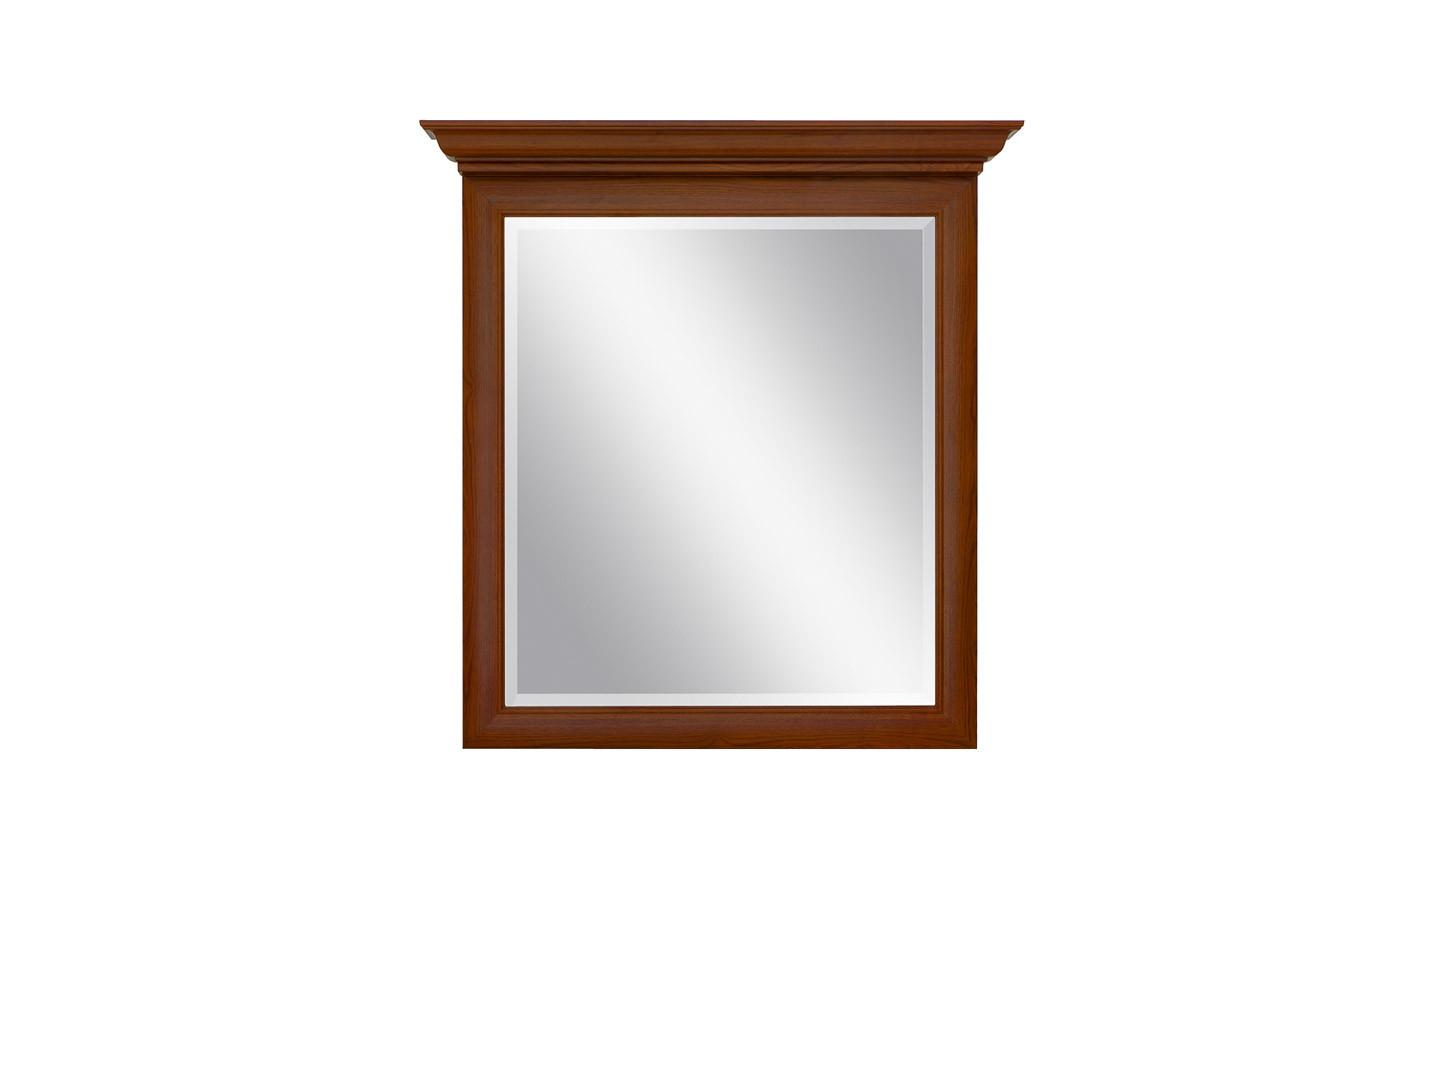 Zrkadlo KENT ELUS 102 gaštan